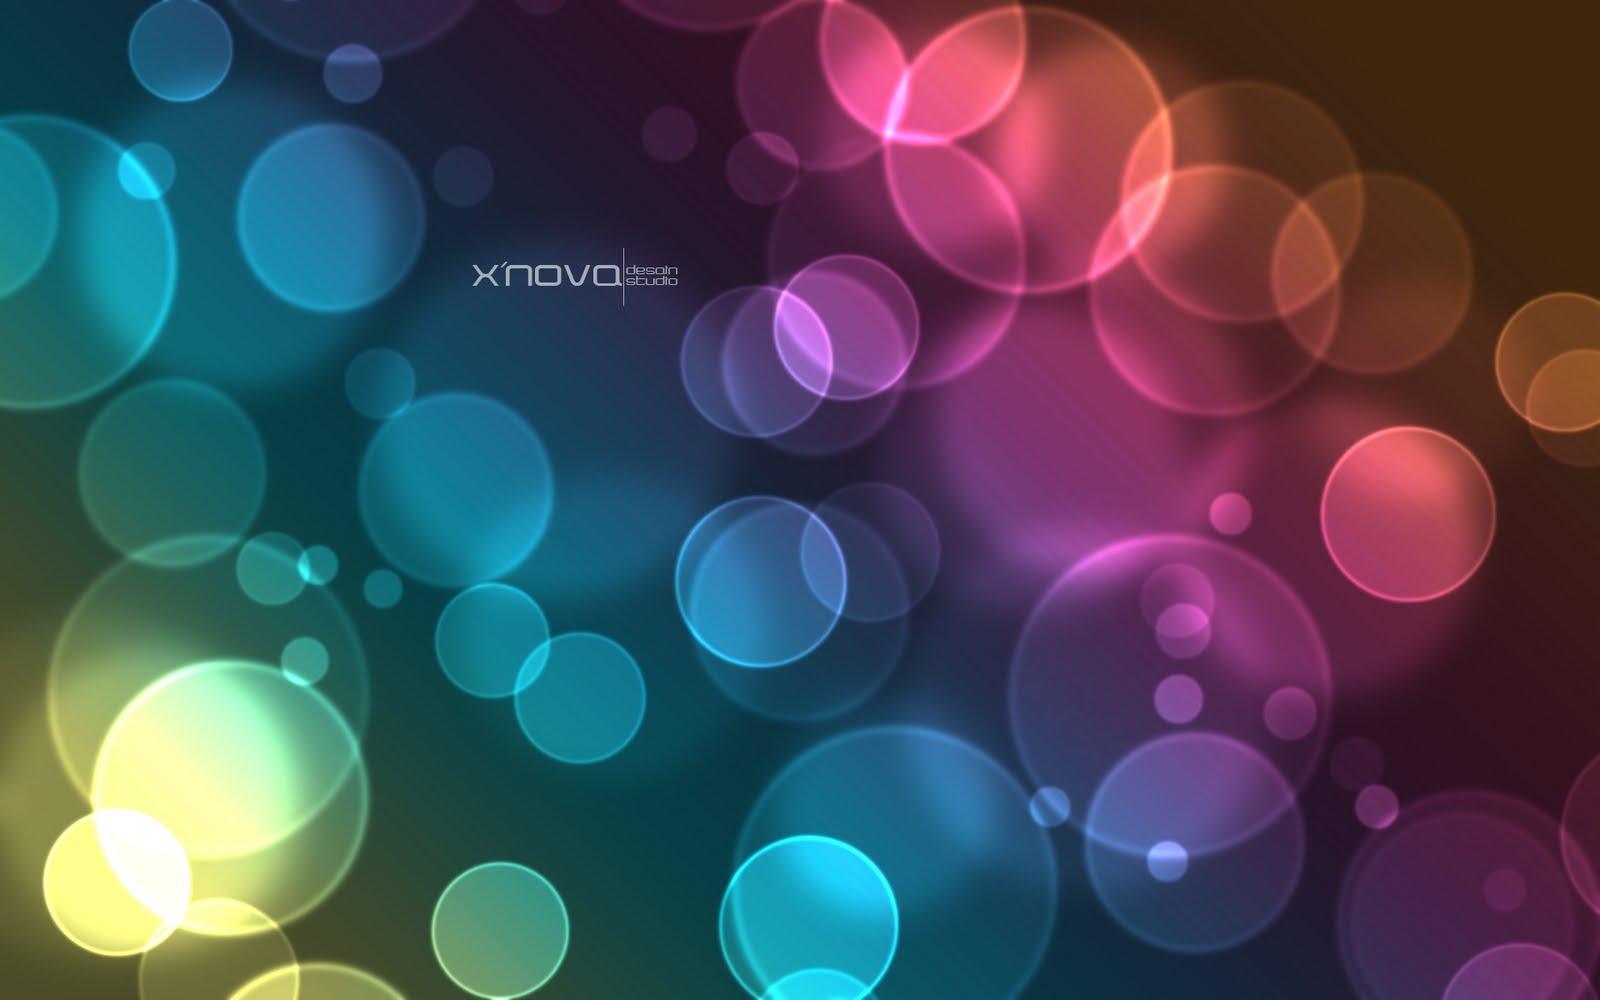 http://4.bp.blogspot.com/_e17DX2QhaV4/TH3HdOFwsmI/AAAAAAAAAIg/q_KmcHUrFhs/s1600/_edit-4.JPG